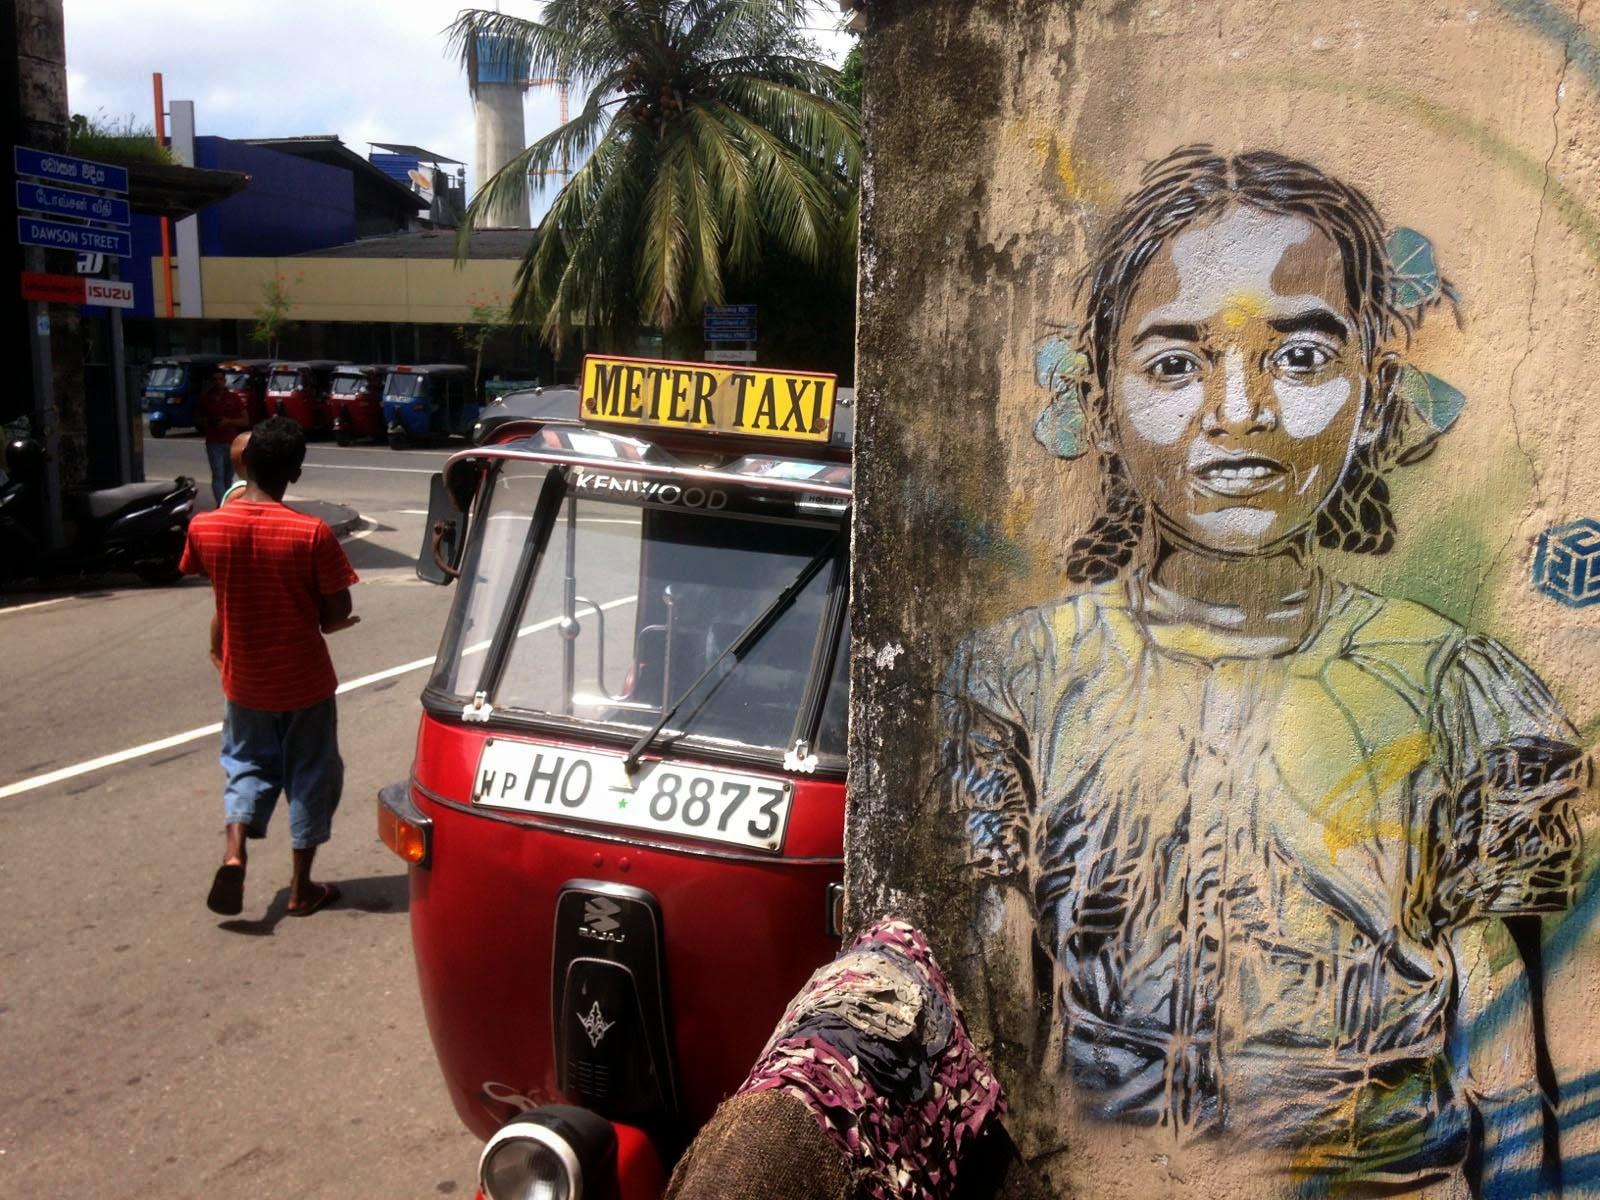 Stencil street artist C215 paints a series of pieces in Sri Lanka